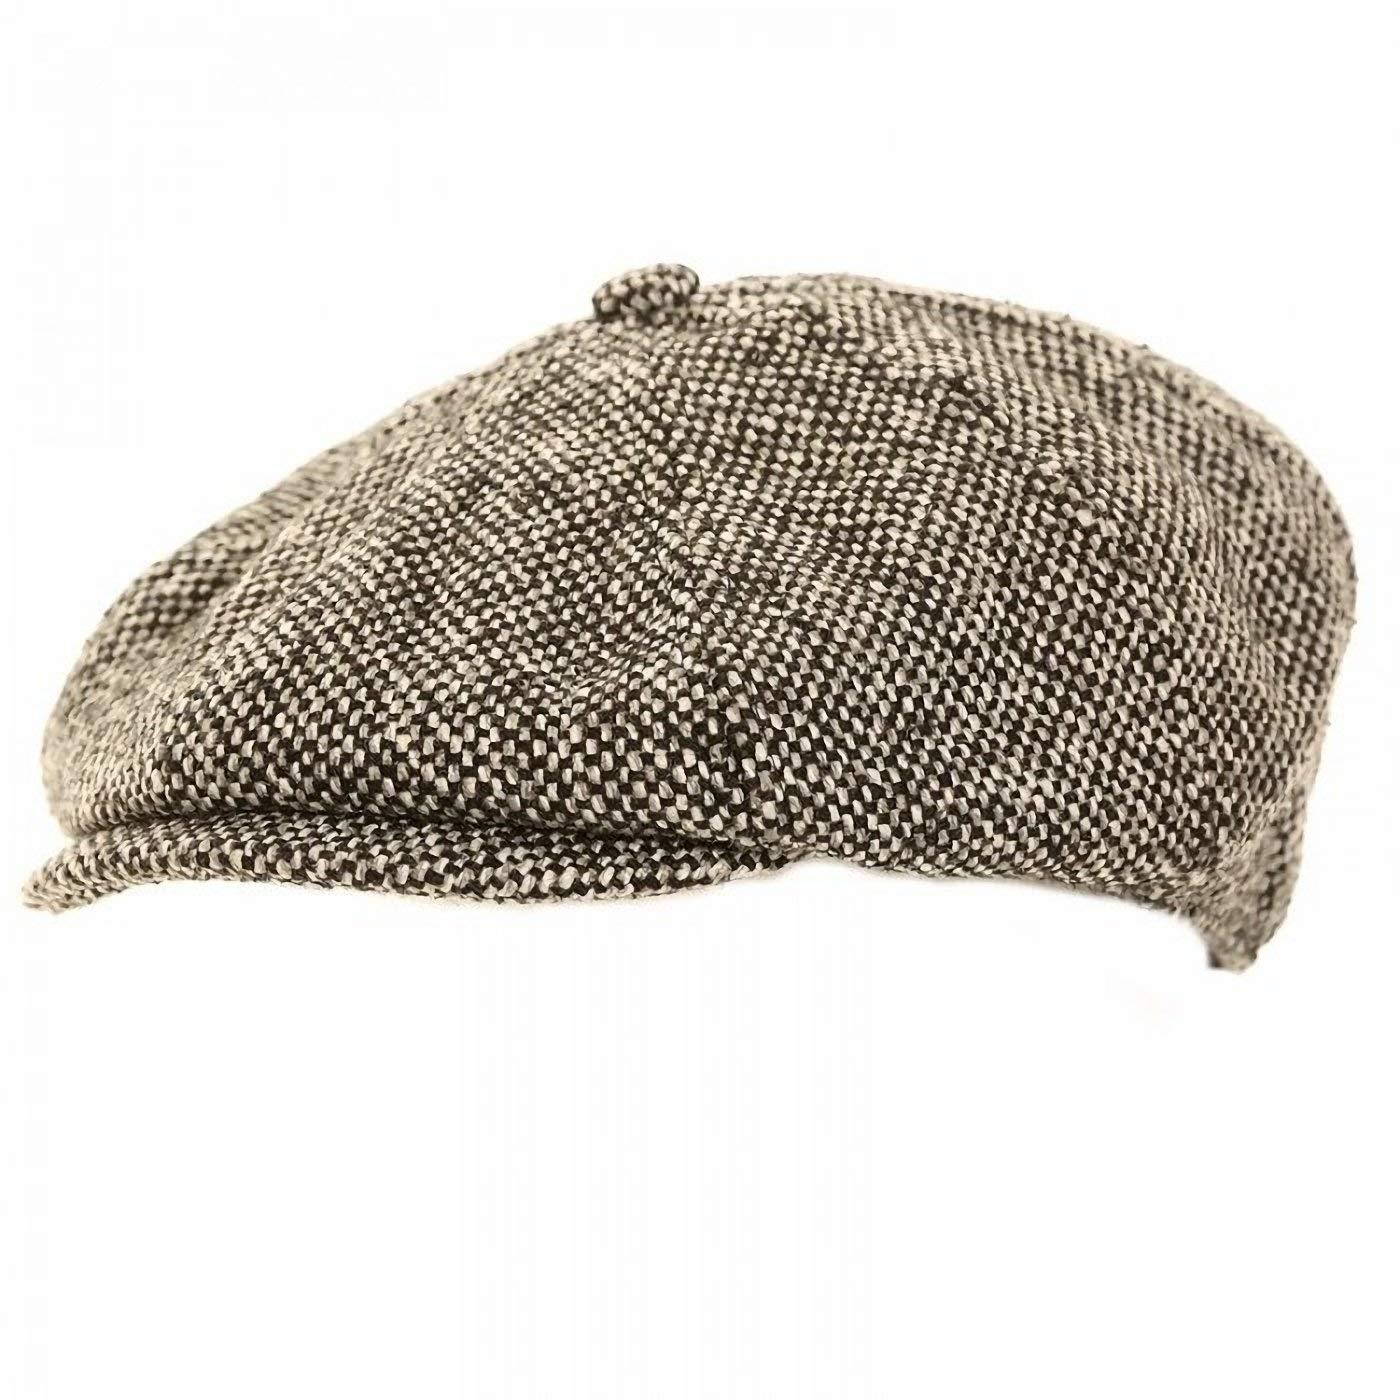 06573b6aa59 Get Quotations · Universal Textiles Mens Wool Blend 8 Panel Newsboy Cap